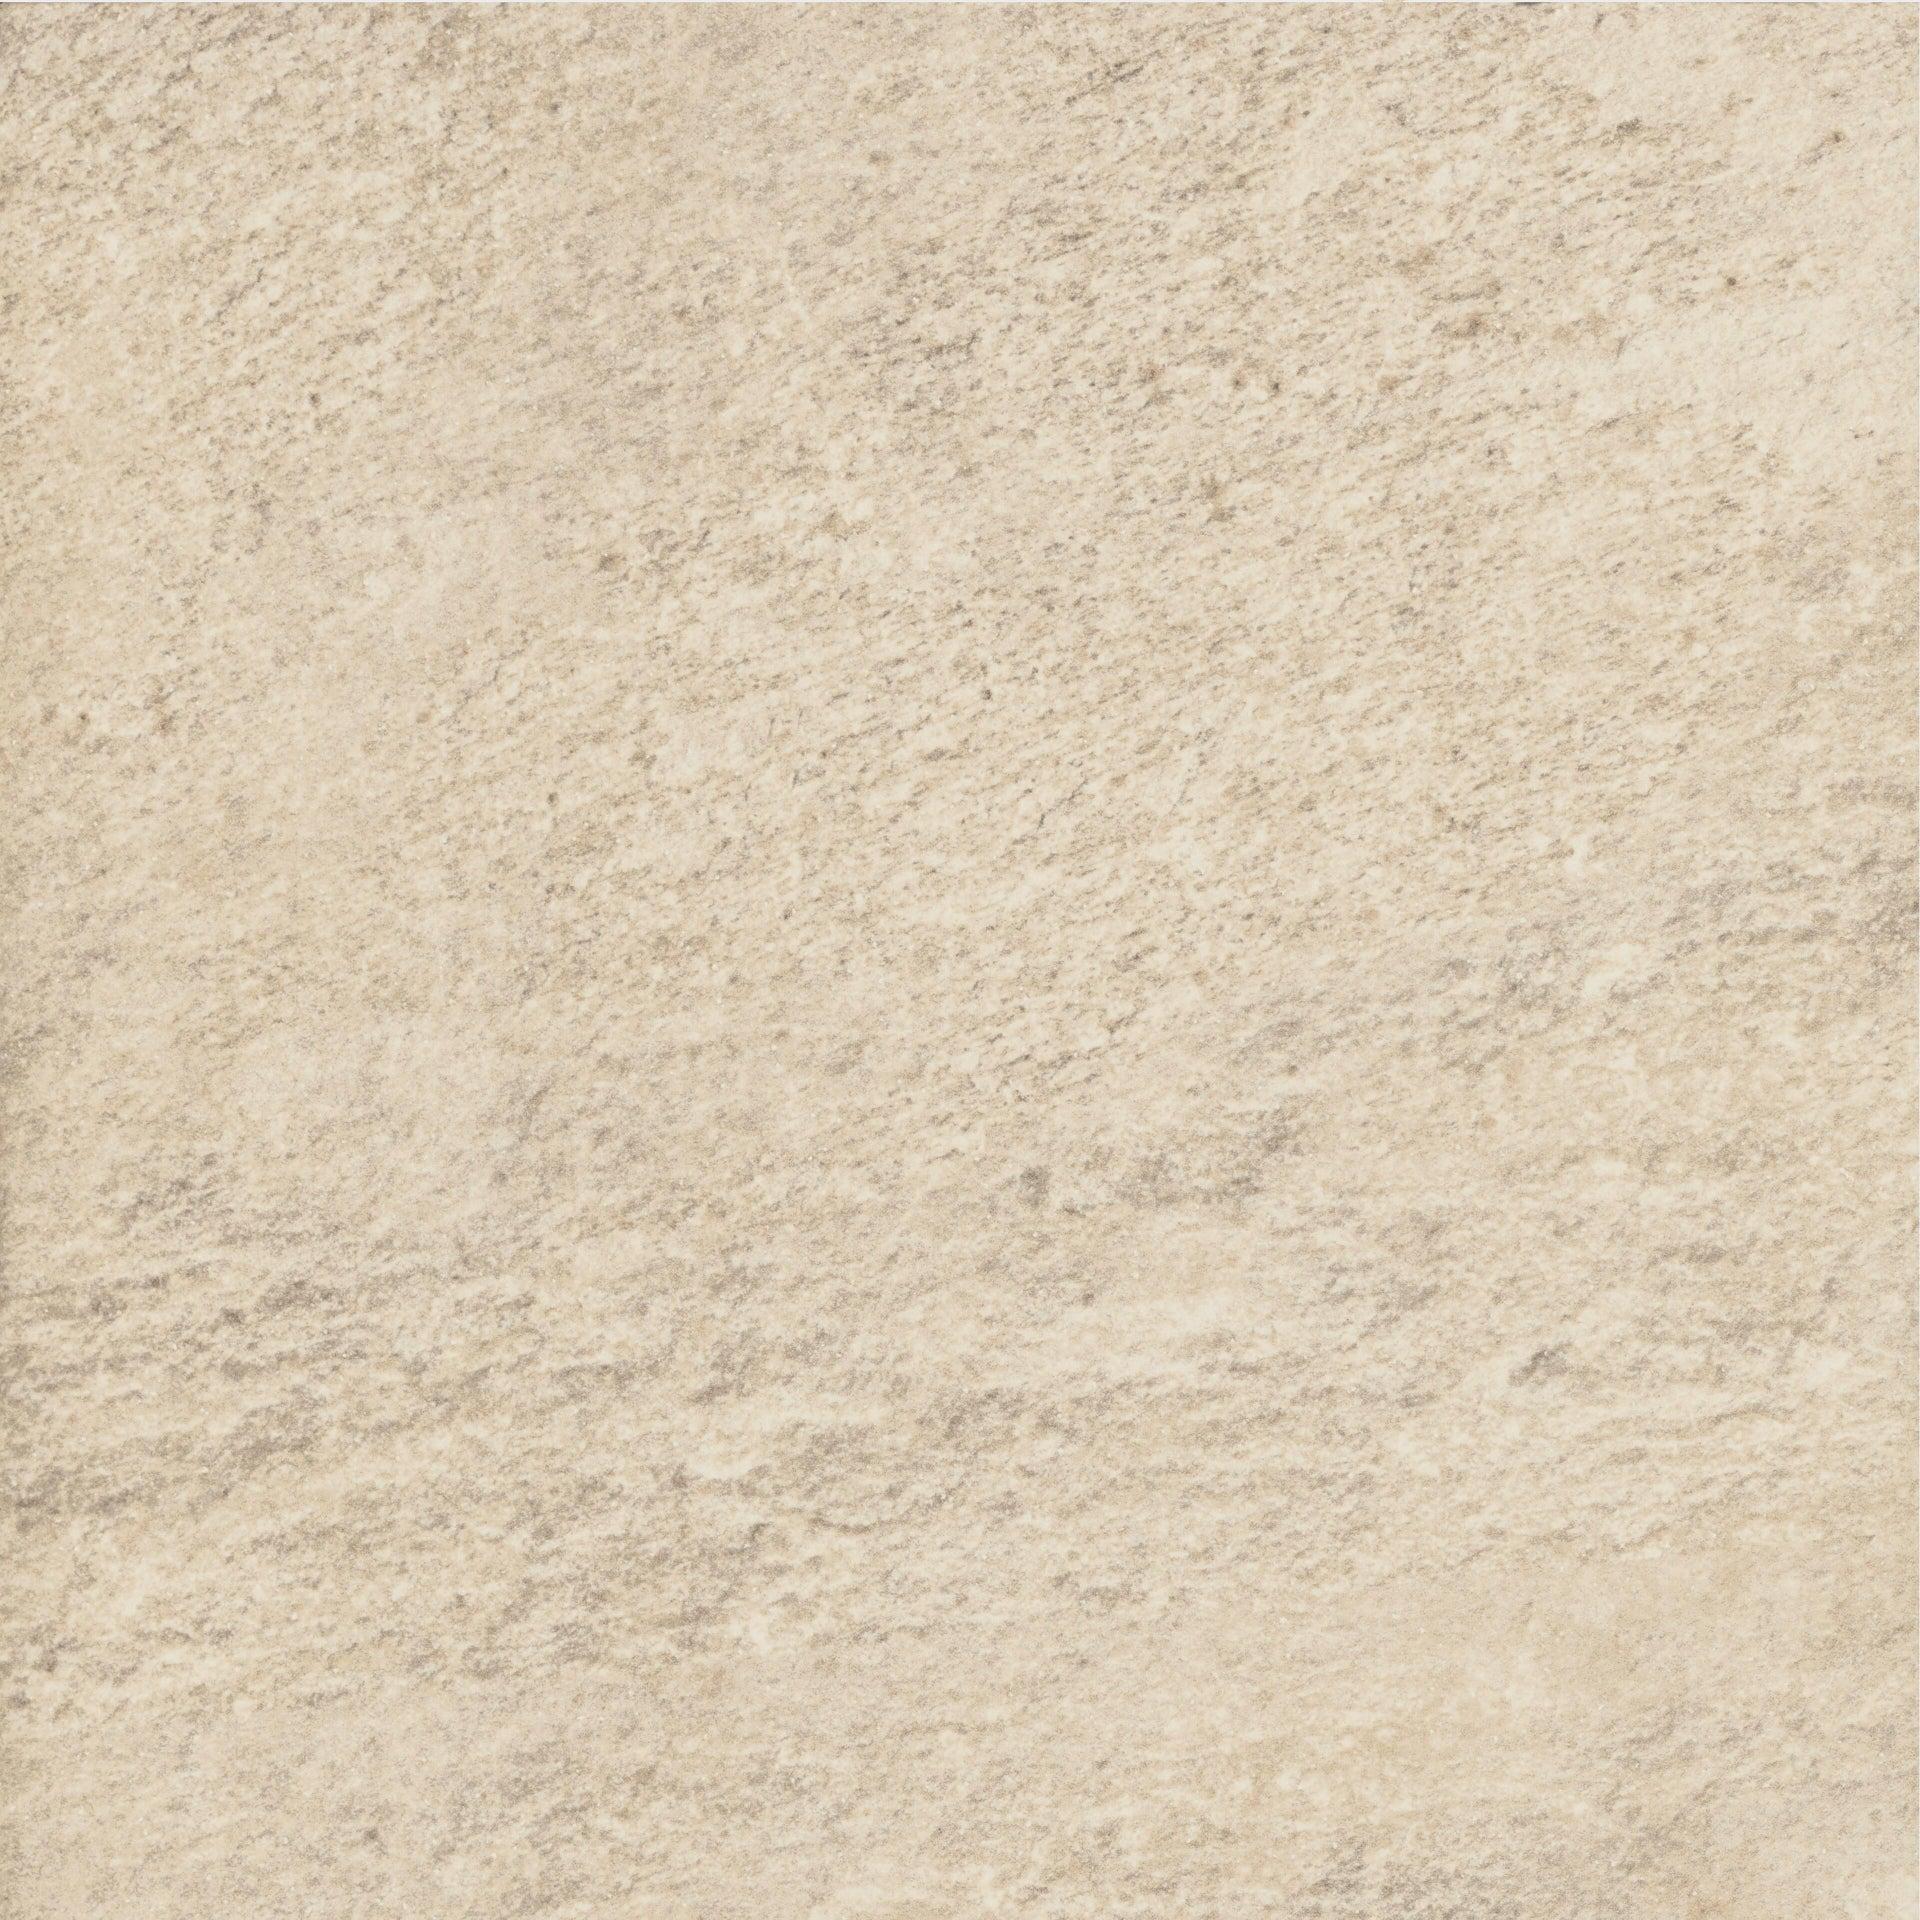 Piastrella da pavimento Walk 32.5 x 32.5 cm sp. 9 mm PEI 3/5 beige - 9